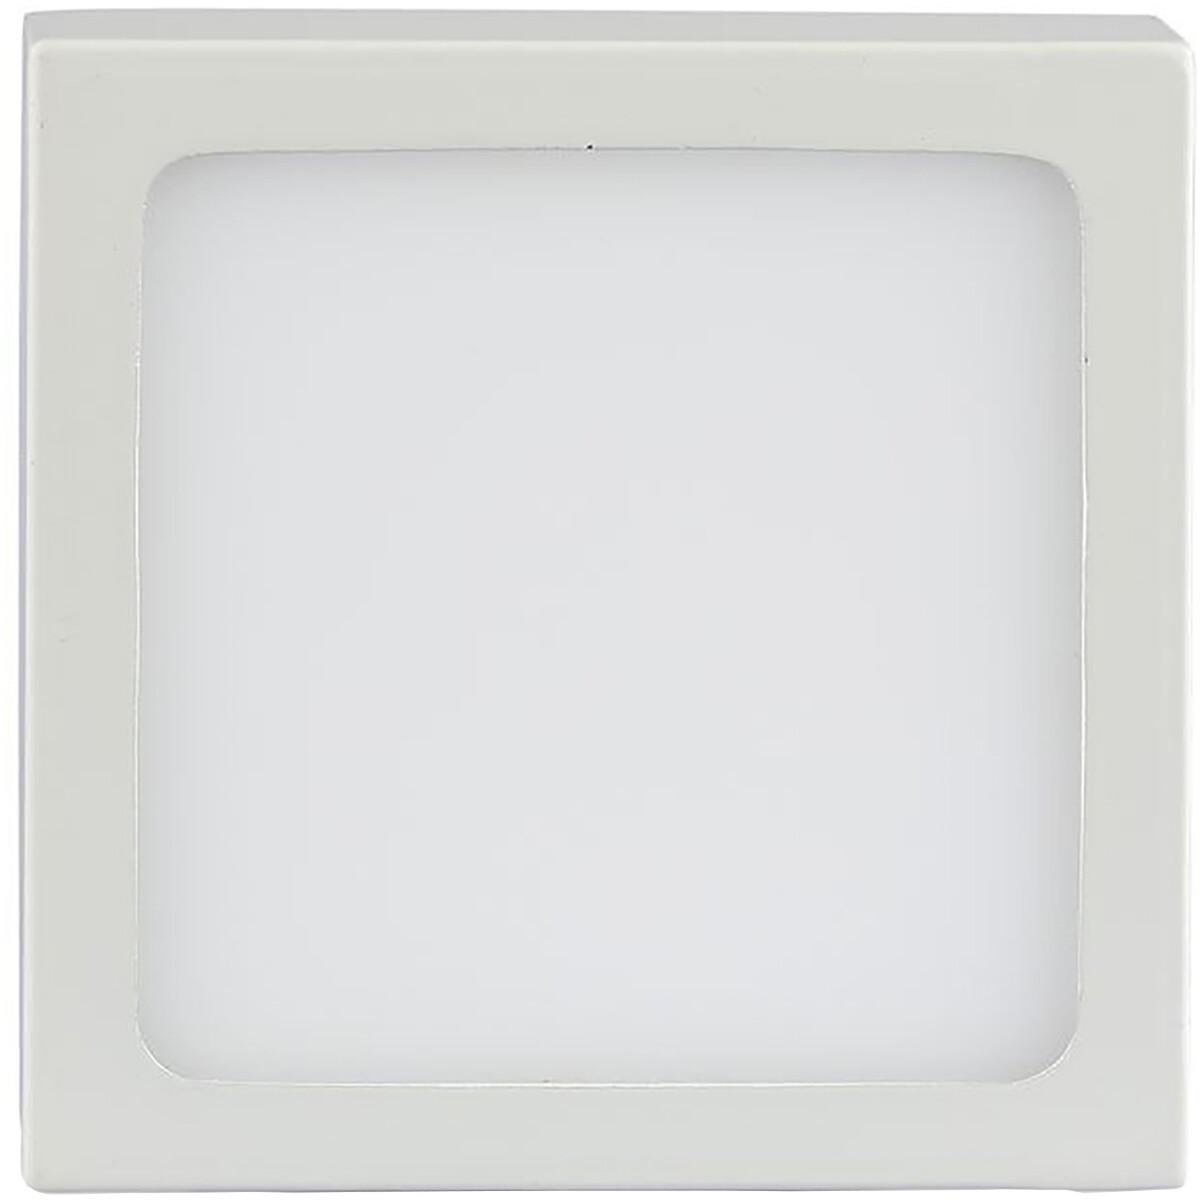 LED Plafondlamp - Viron Unva - Opbouw Vierkant 18W - Warm Wit 3000K - Mat Wit - Aluminium - Ø190mm